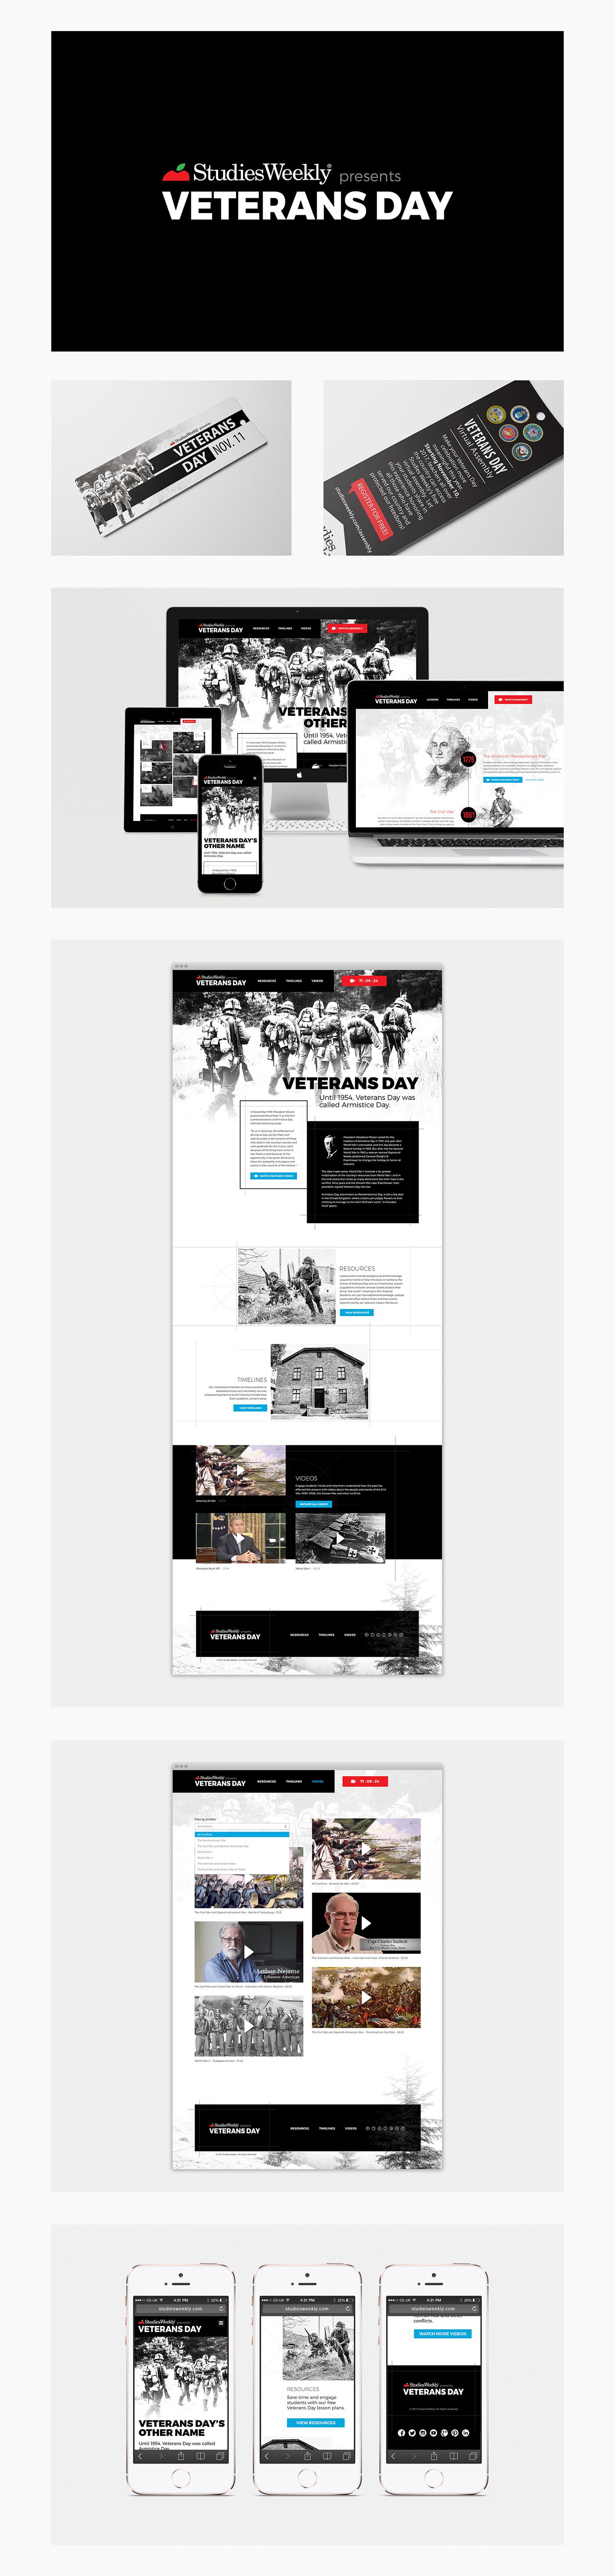 Website Design graphic design  branding  Education Veterans Day bookmarks